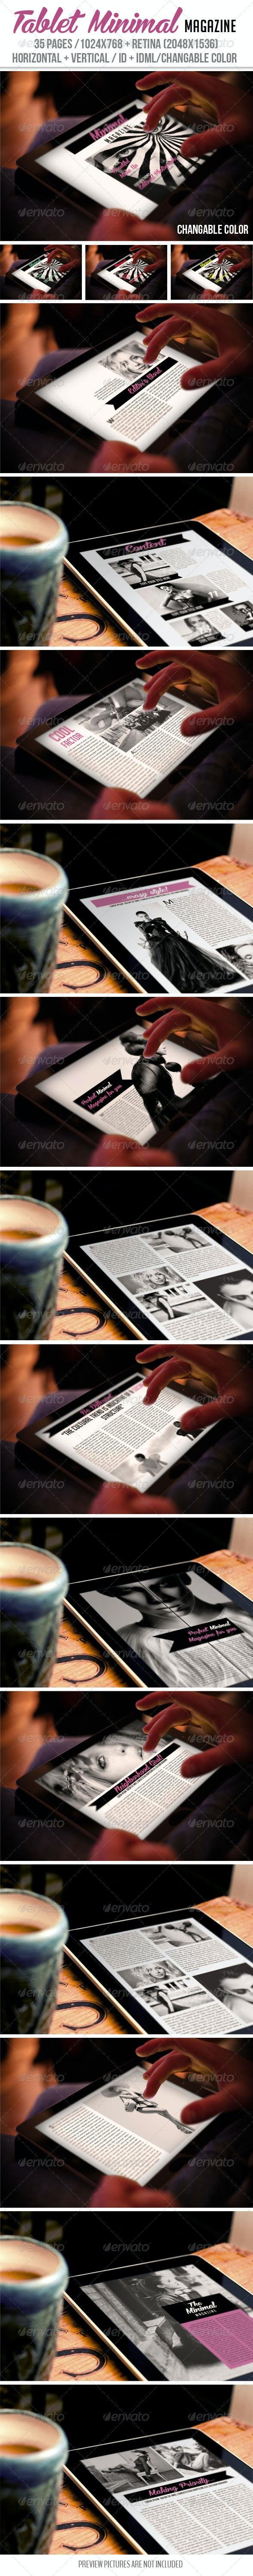 iPad & Tablet Minimal Magazine - Digital Magazines ePublishing